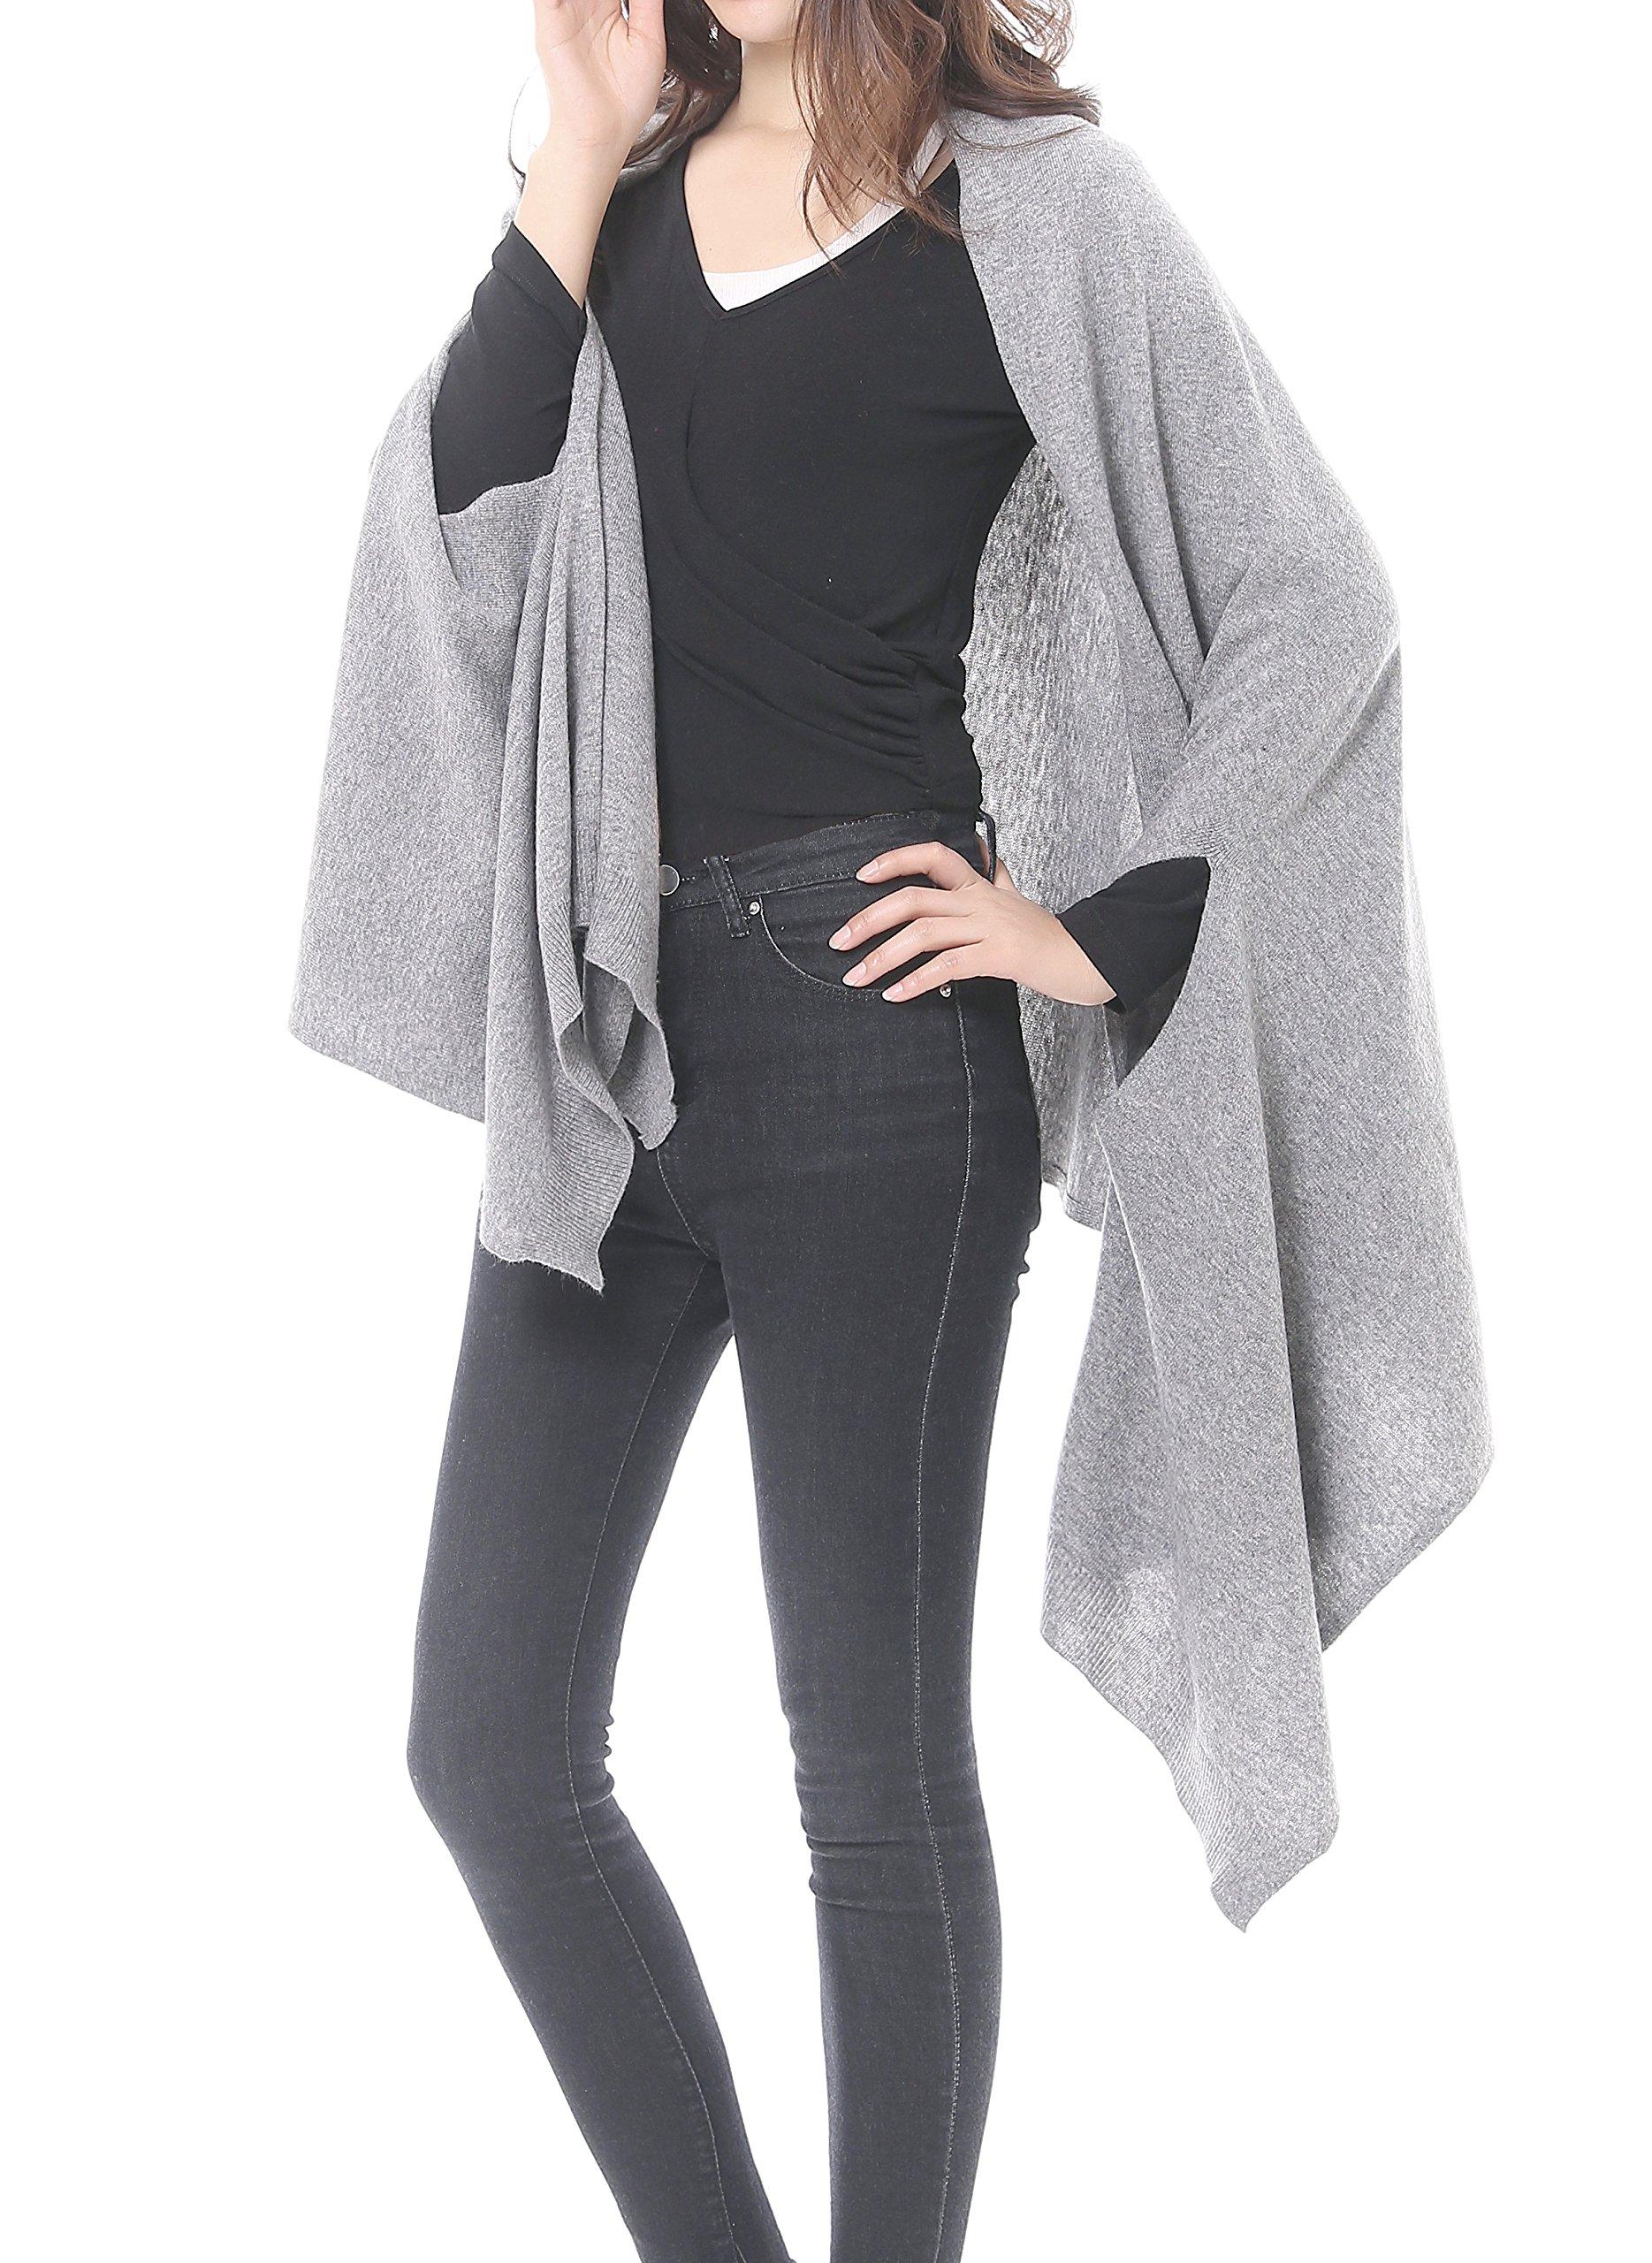 Bruceriver Women's Wool Blended Versatile Multi Style Long Knit Scarf (Light Gray-XS/S) by BRUCERIVER